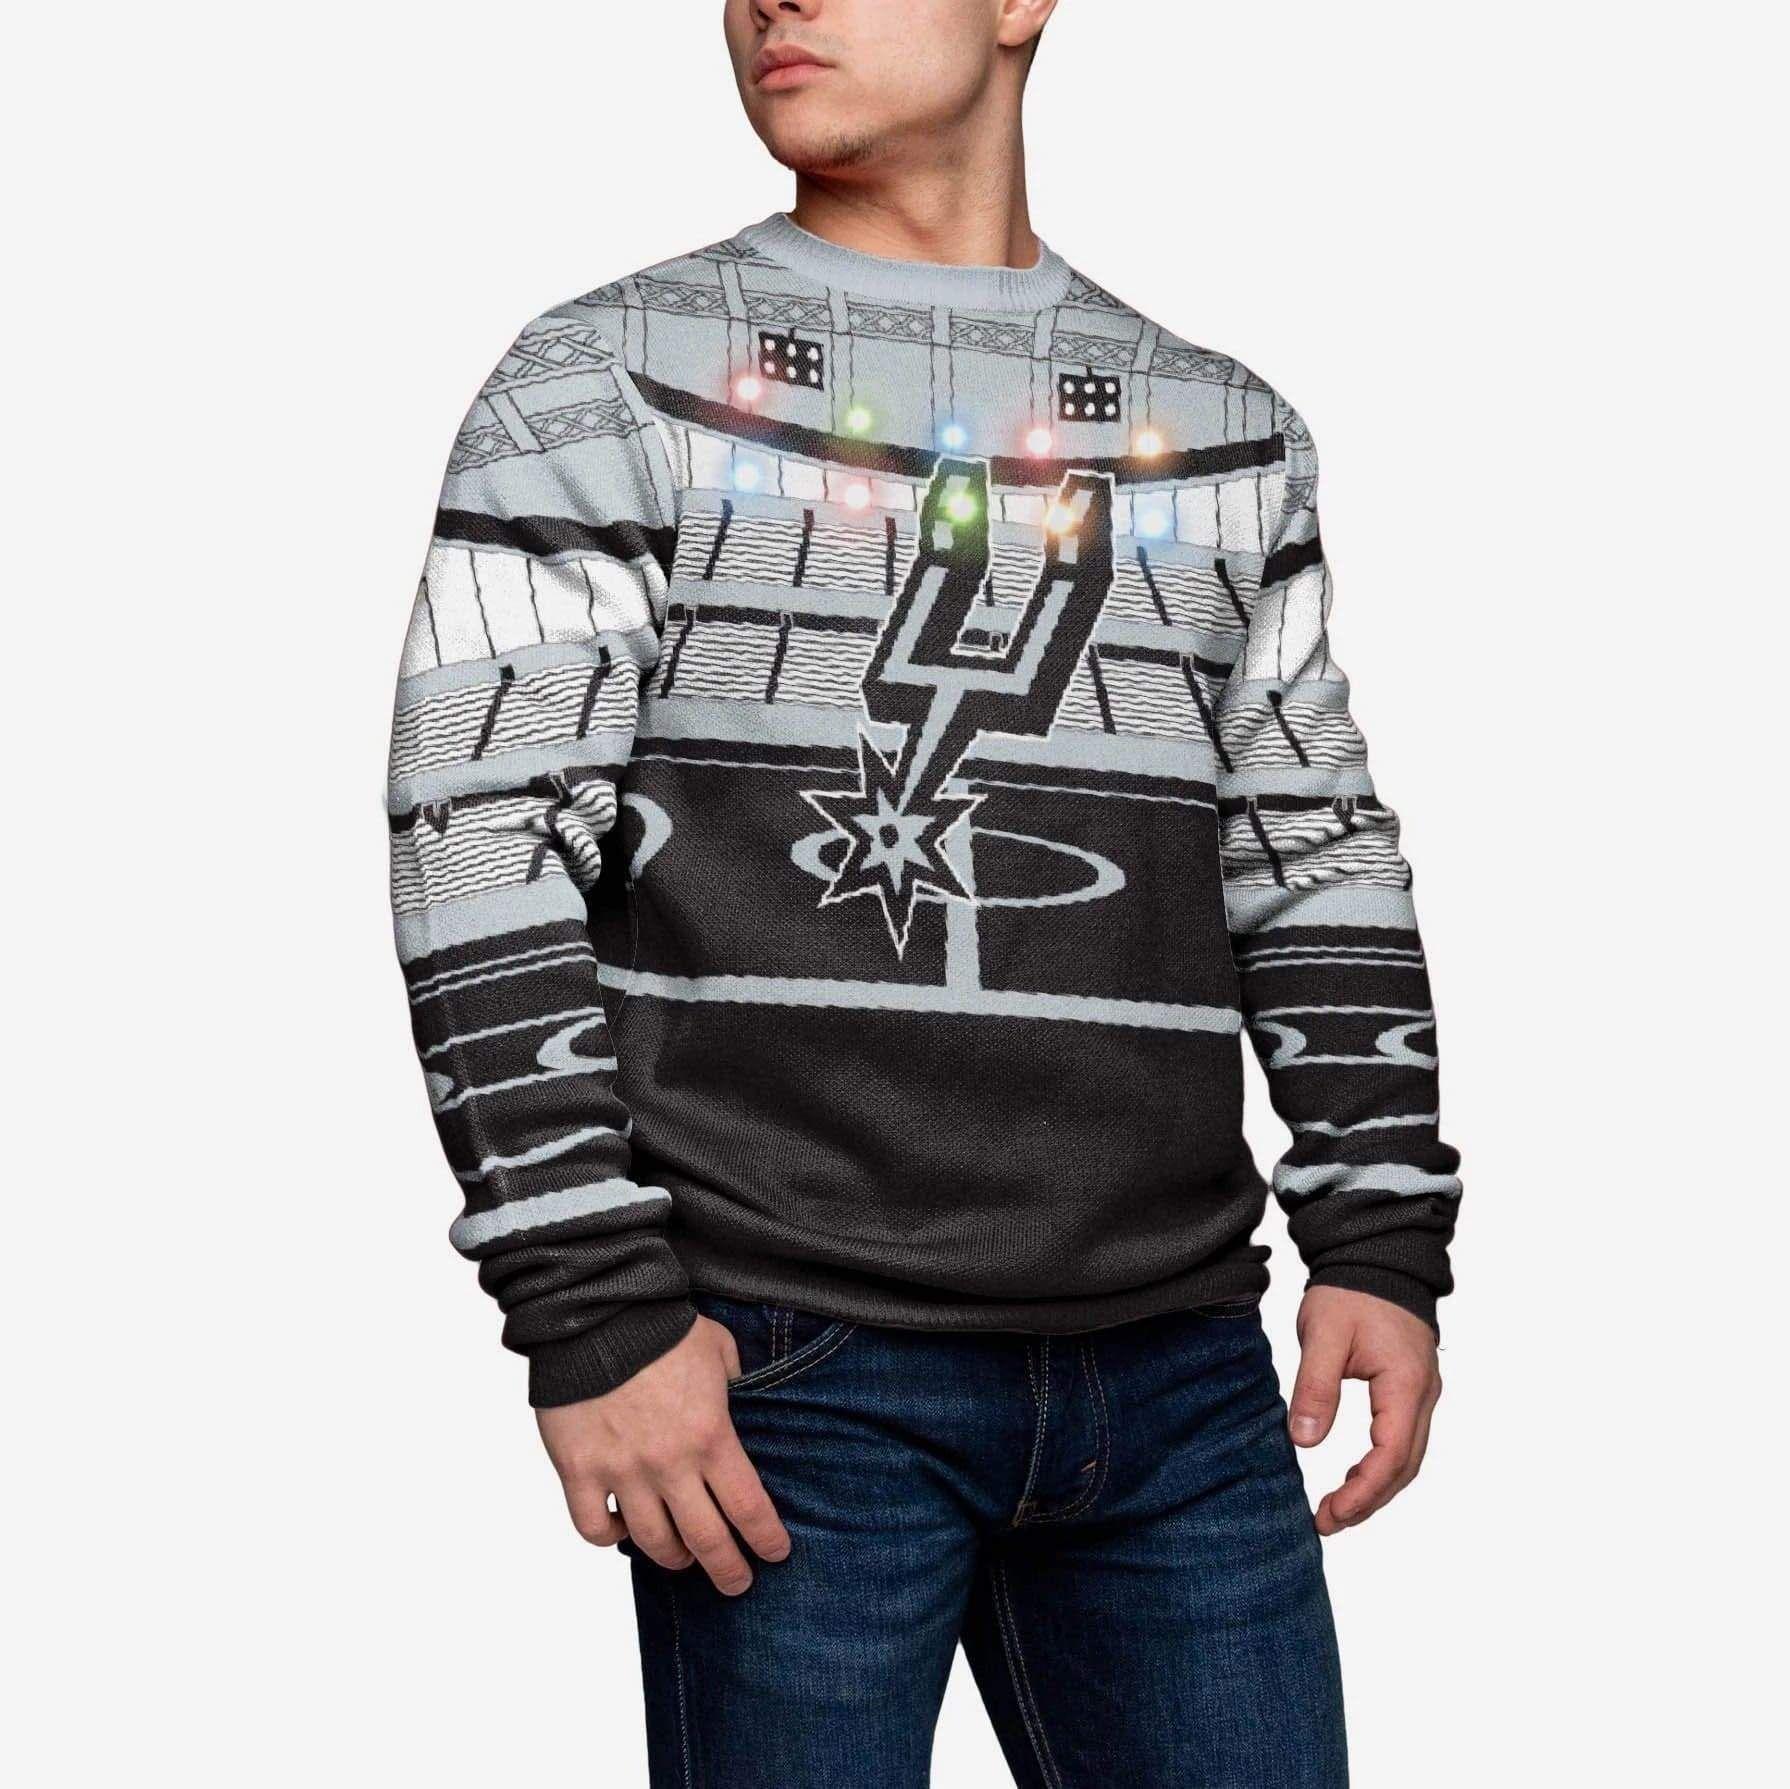 Predownload: San Antonio Spurs Light Up Bluetooth Sweater In 2021 San Antonio Spurs San Antonio Spurs [ 1789 x 1790 Pixel ]